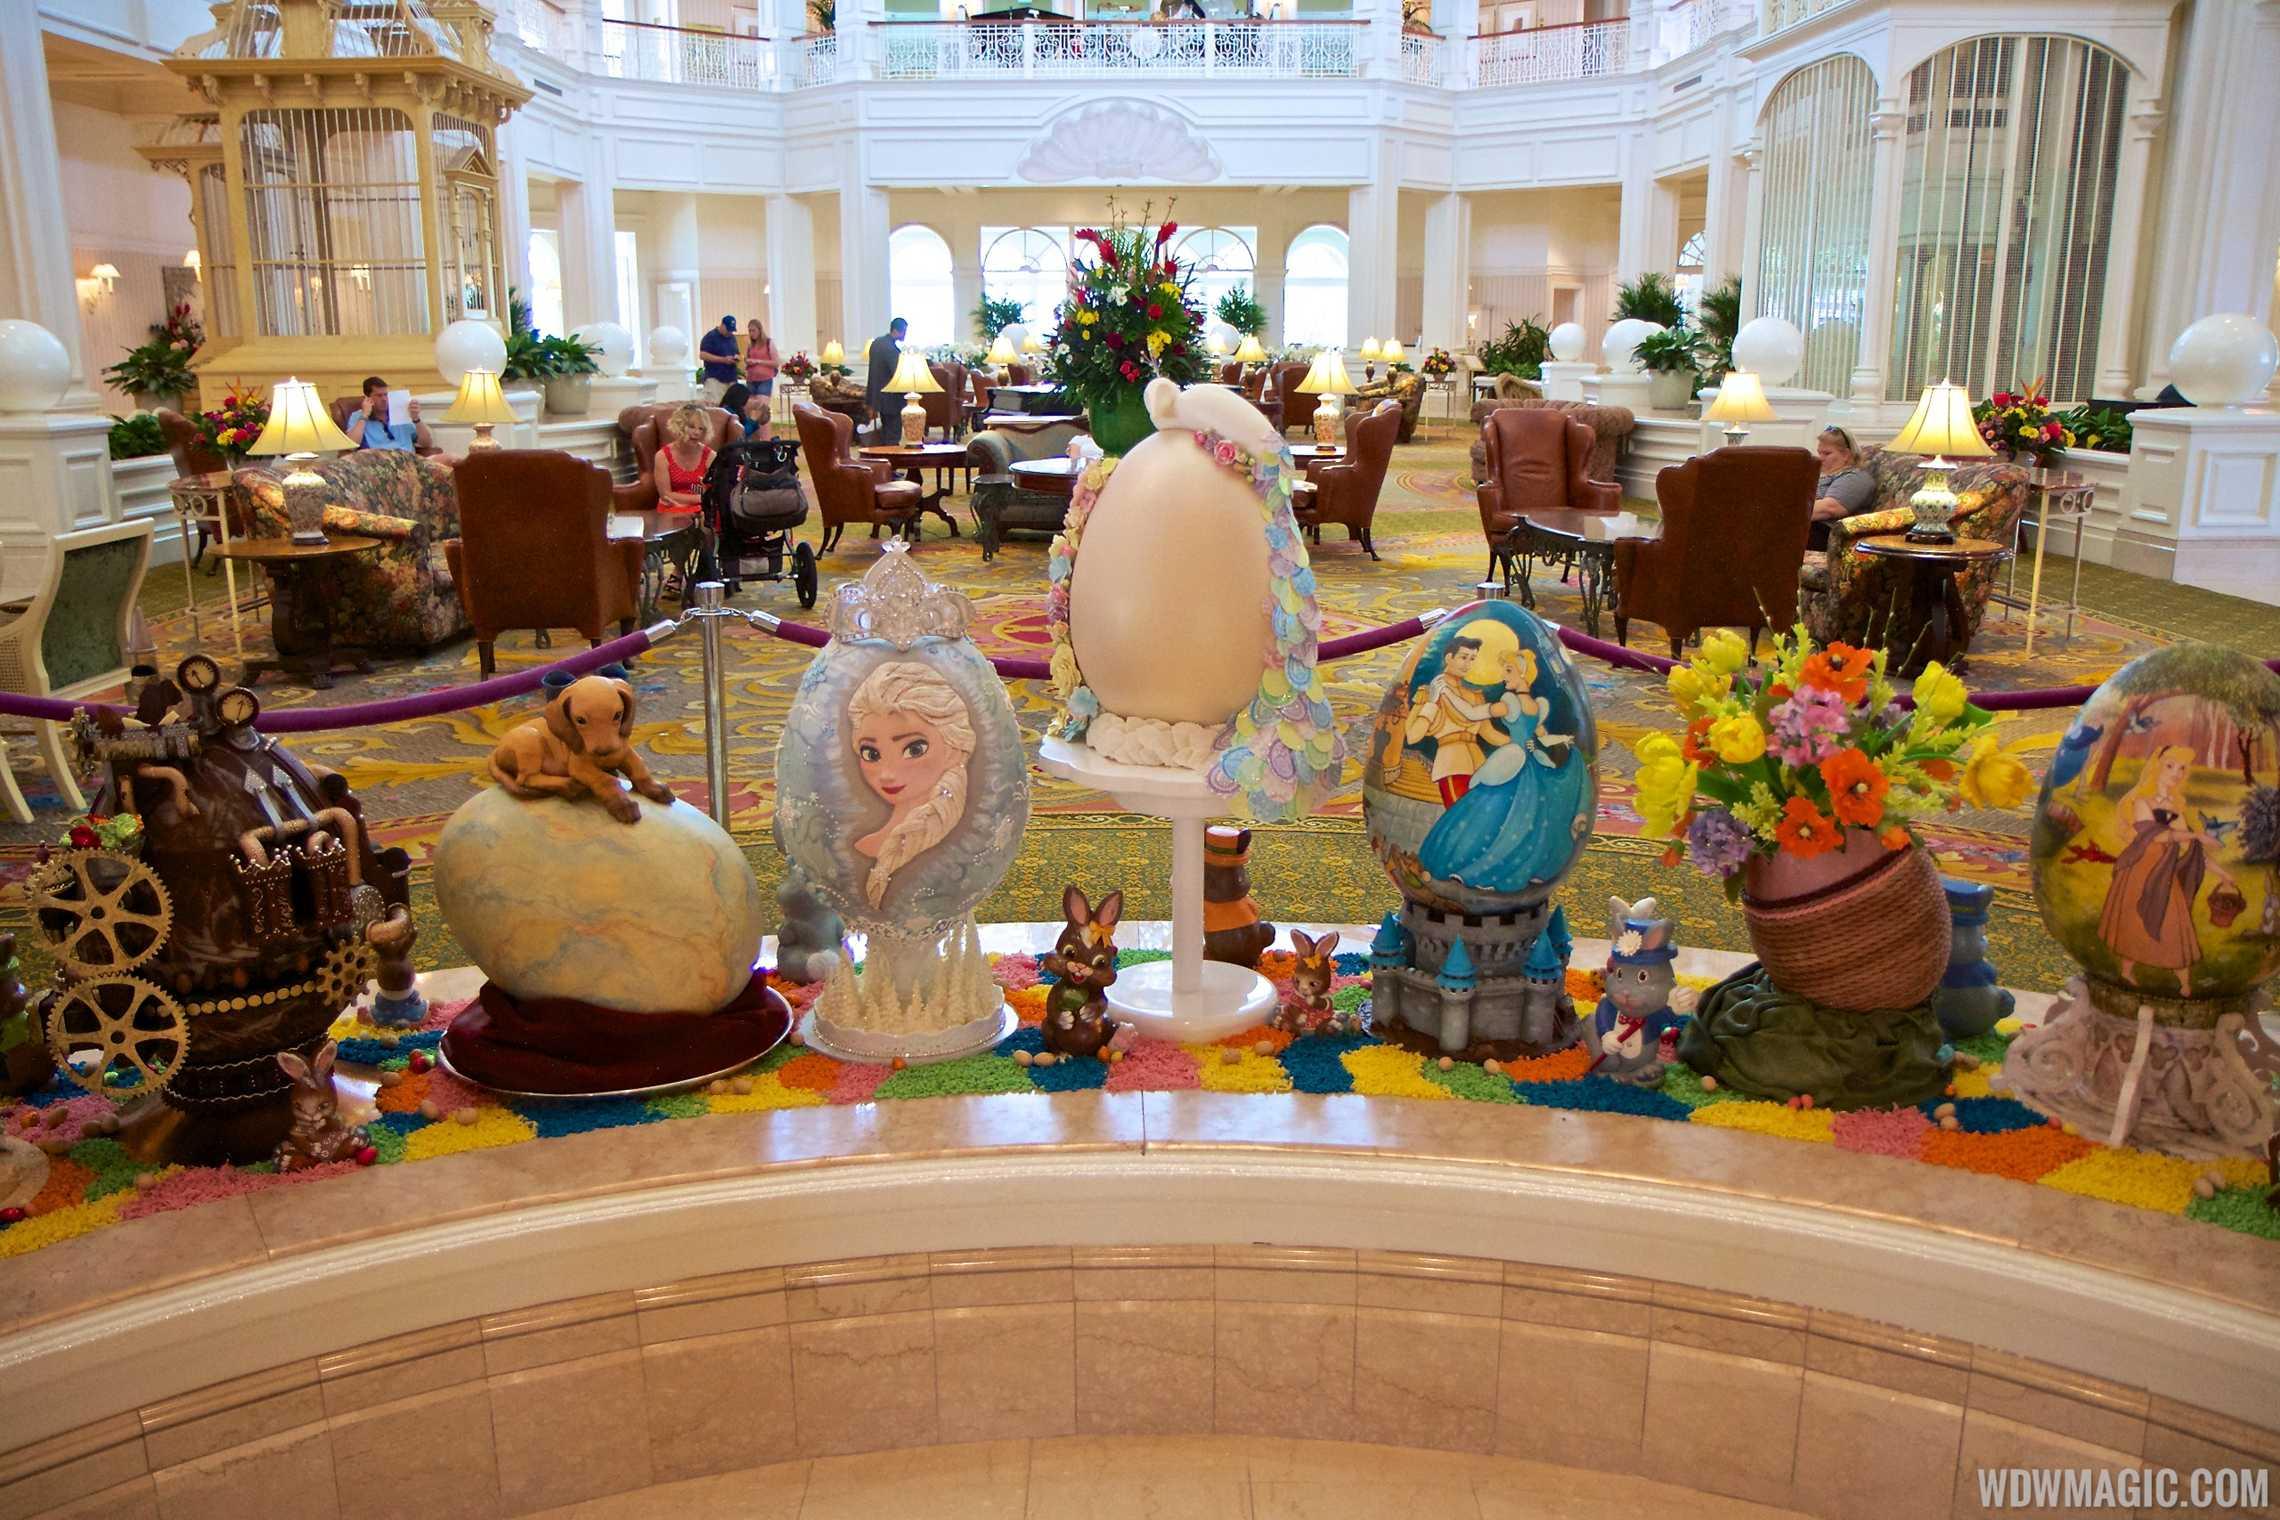 Grand Floridian Resort Easter Egg display